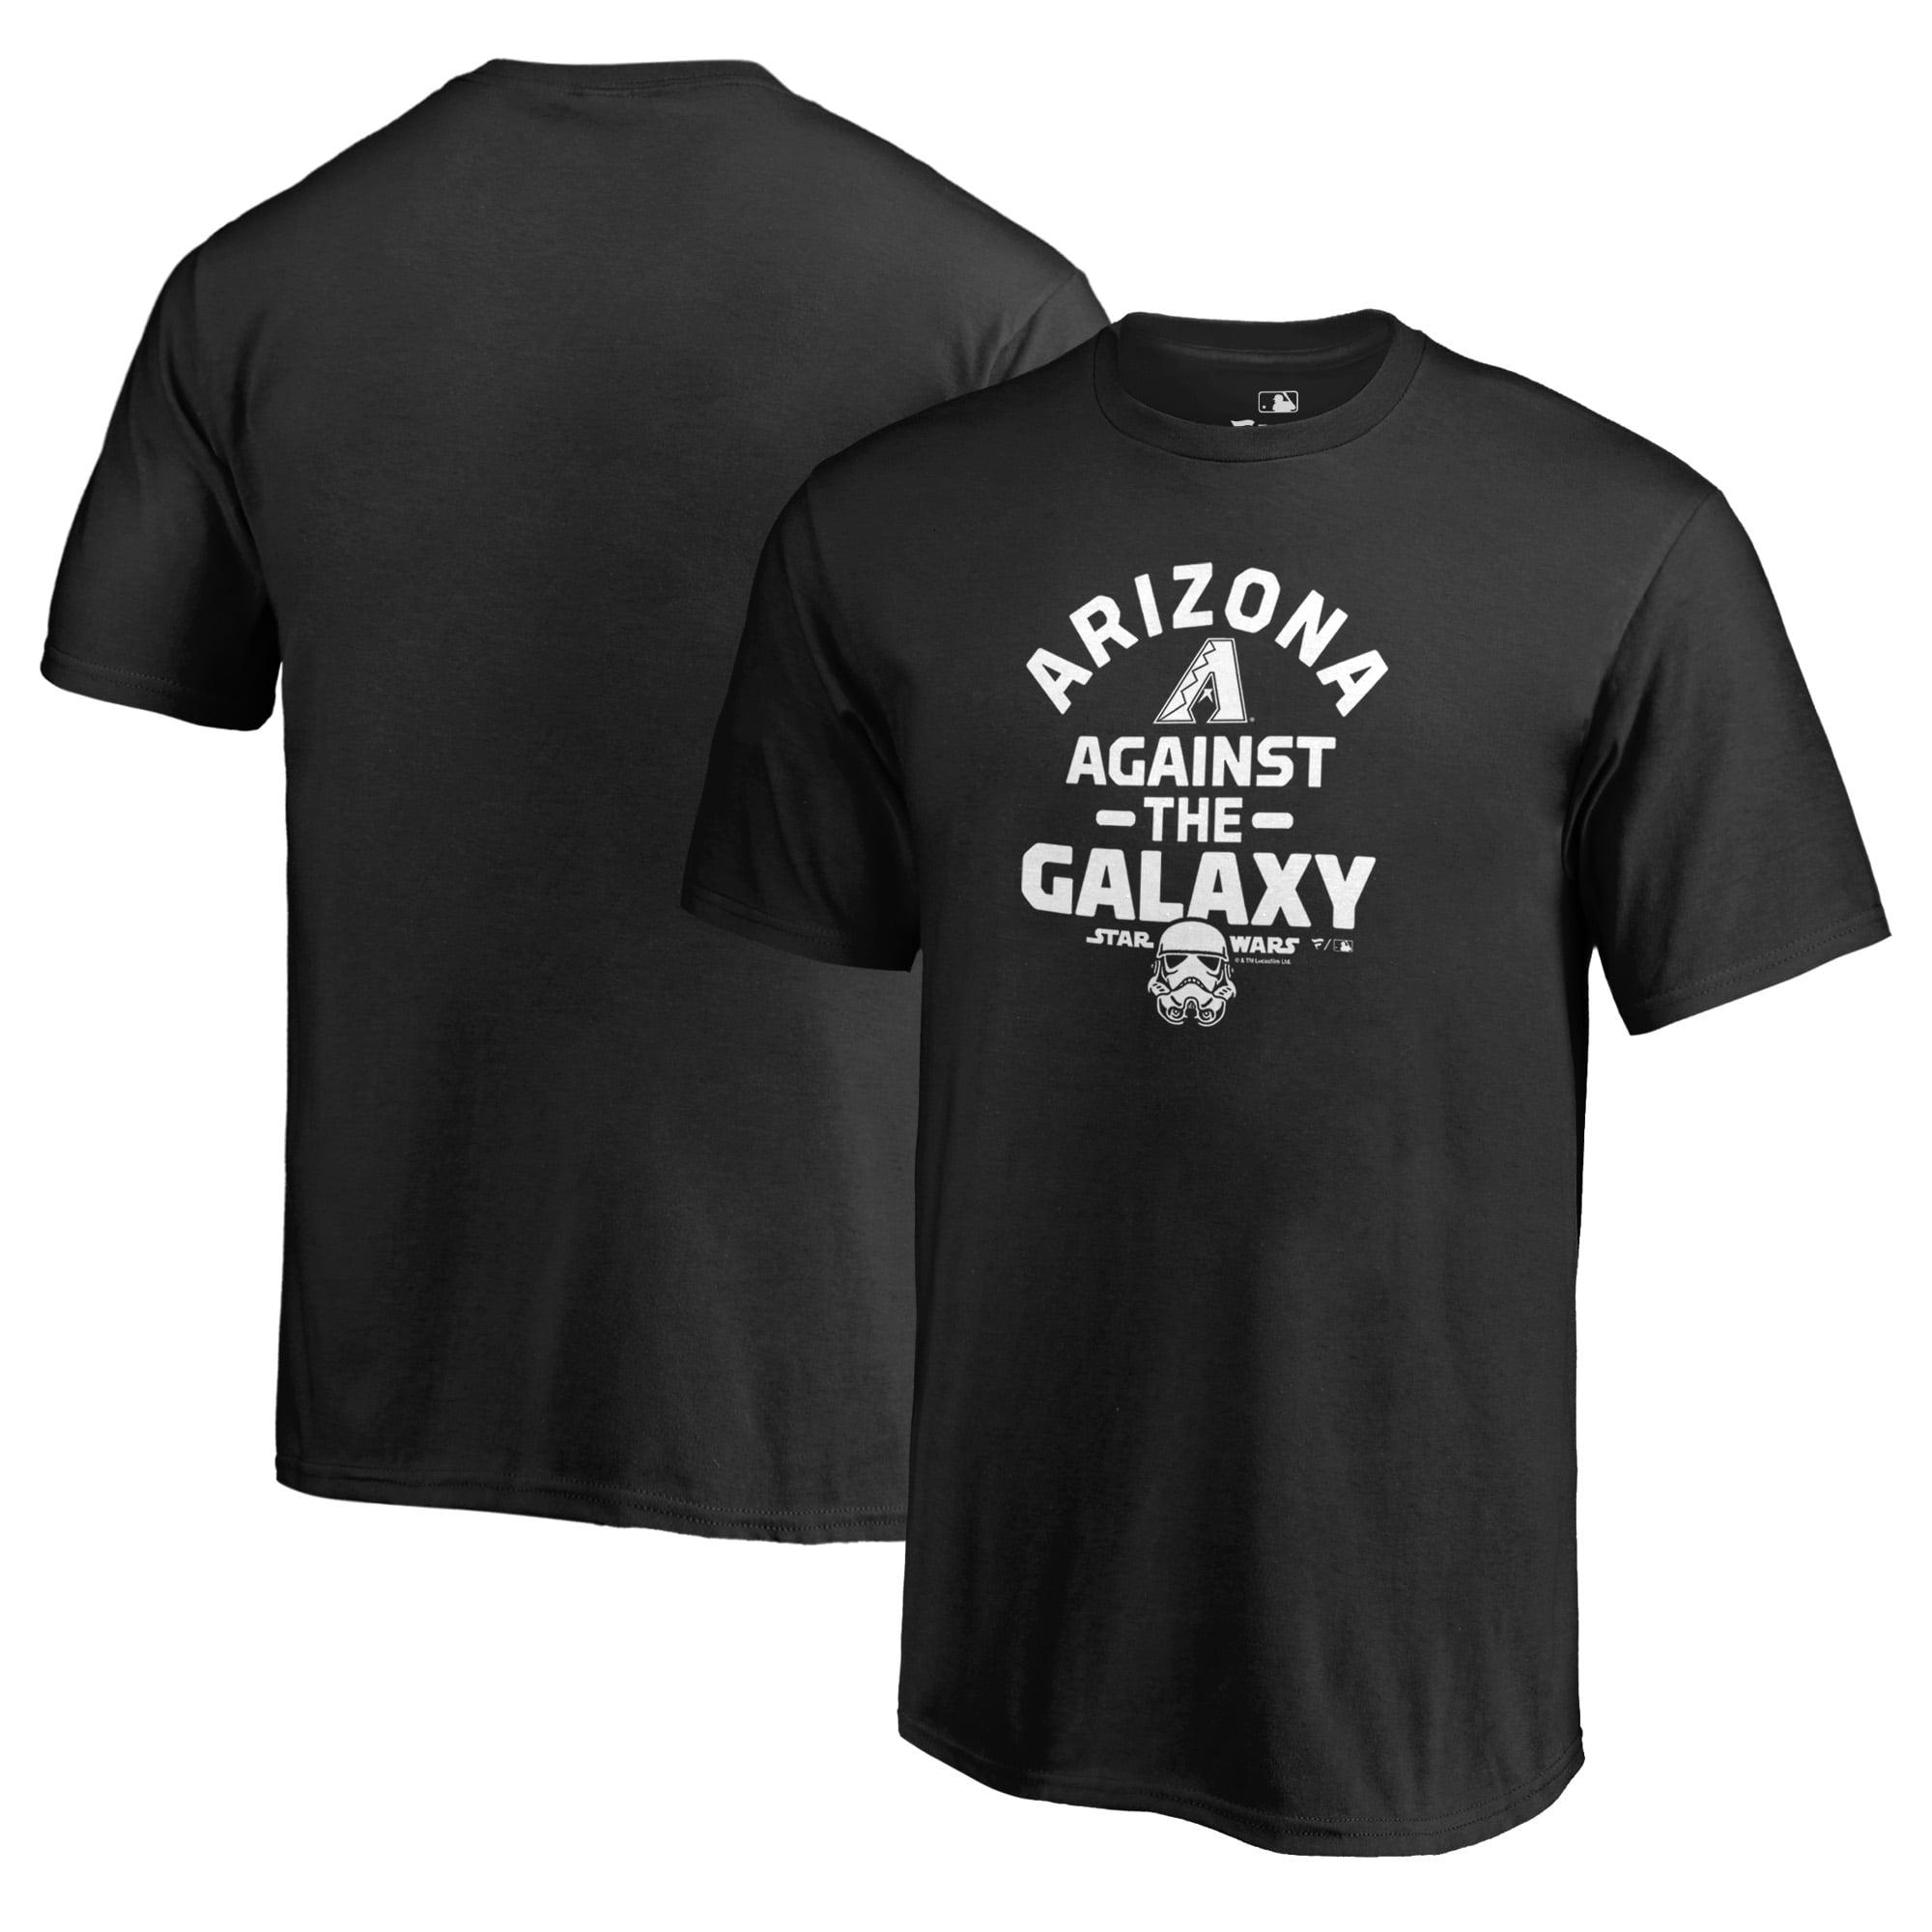 Arizona Diamondbacks Fanatics Branded Youth MLB Star Wars Against The Galaxy T-Shirt - Black